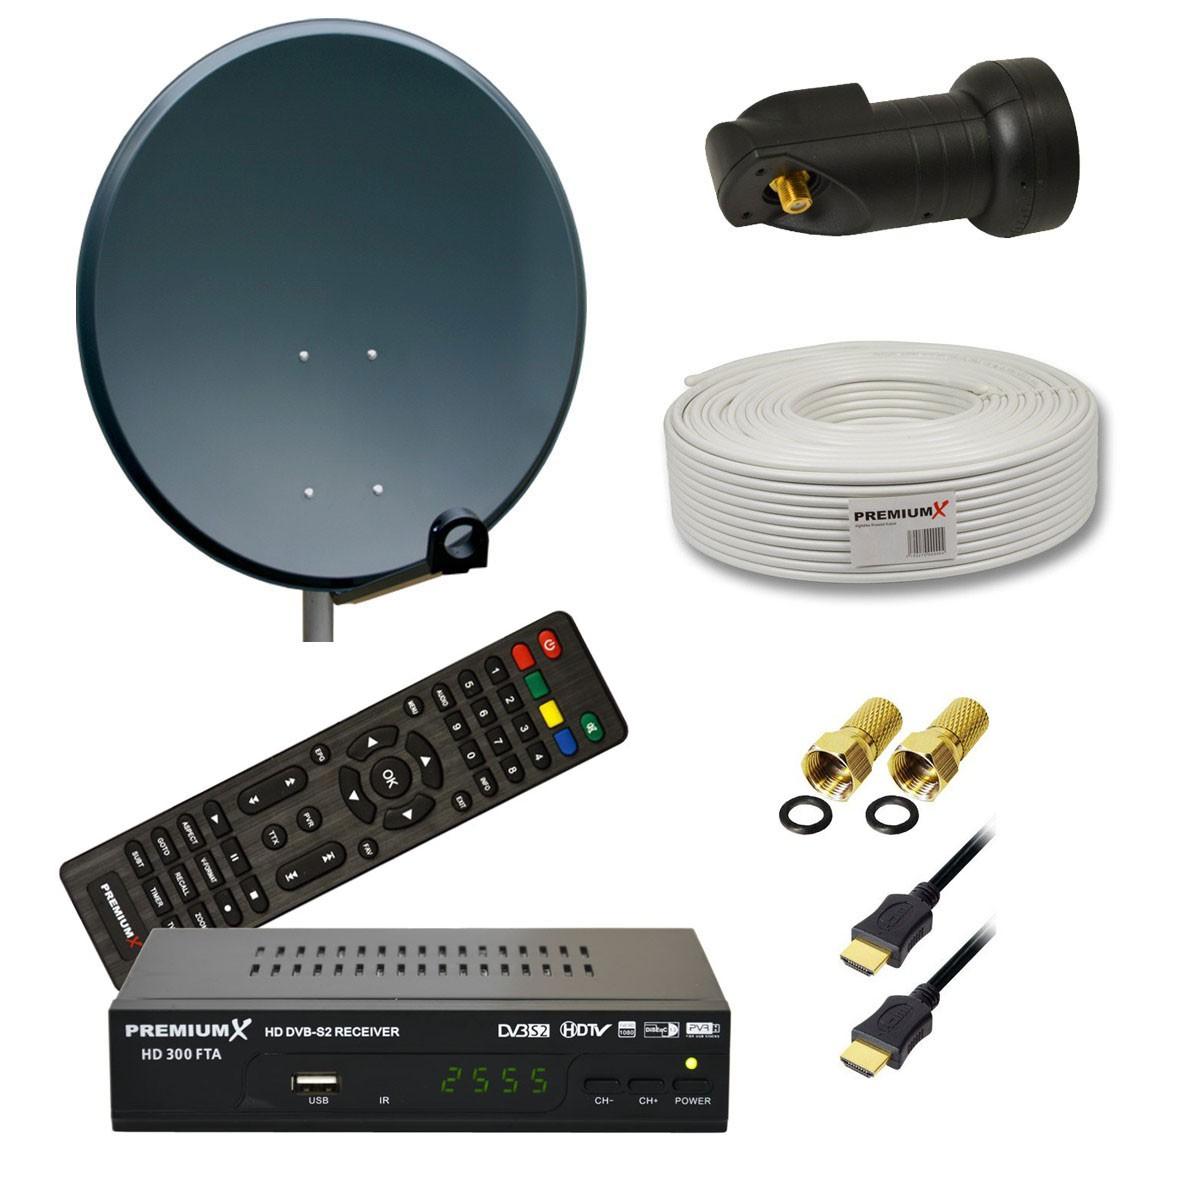 premiumx digital sat anlage 80cm sch ssel single lnb full hd receiver mit kabel ebay